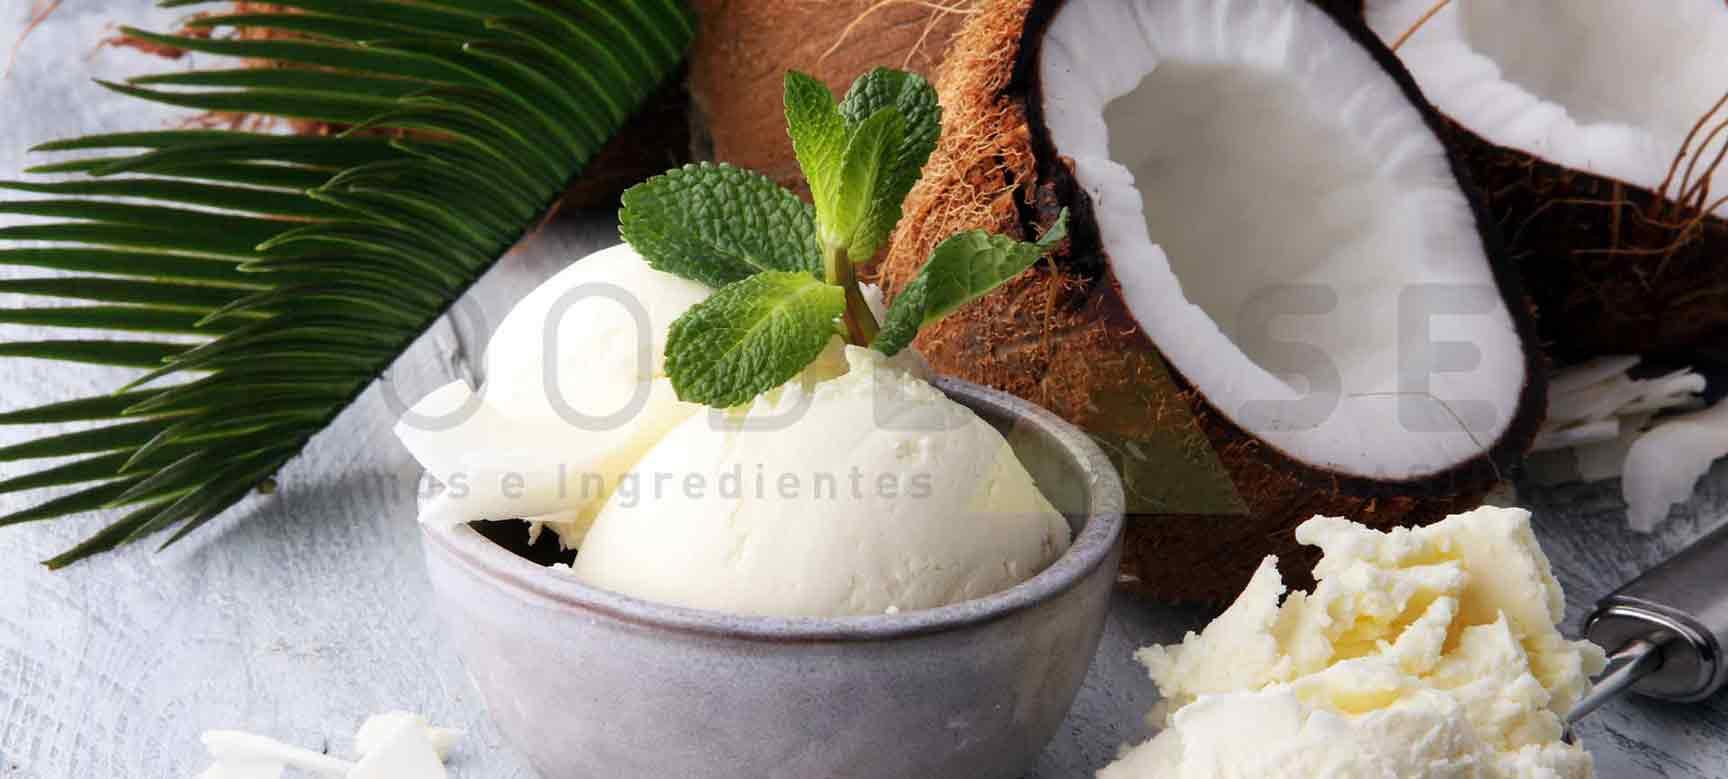 Foodbase - Sorvete de água de coco vegano